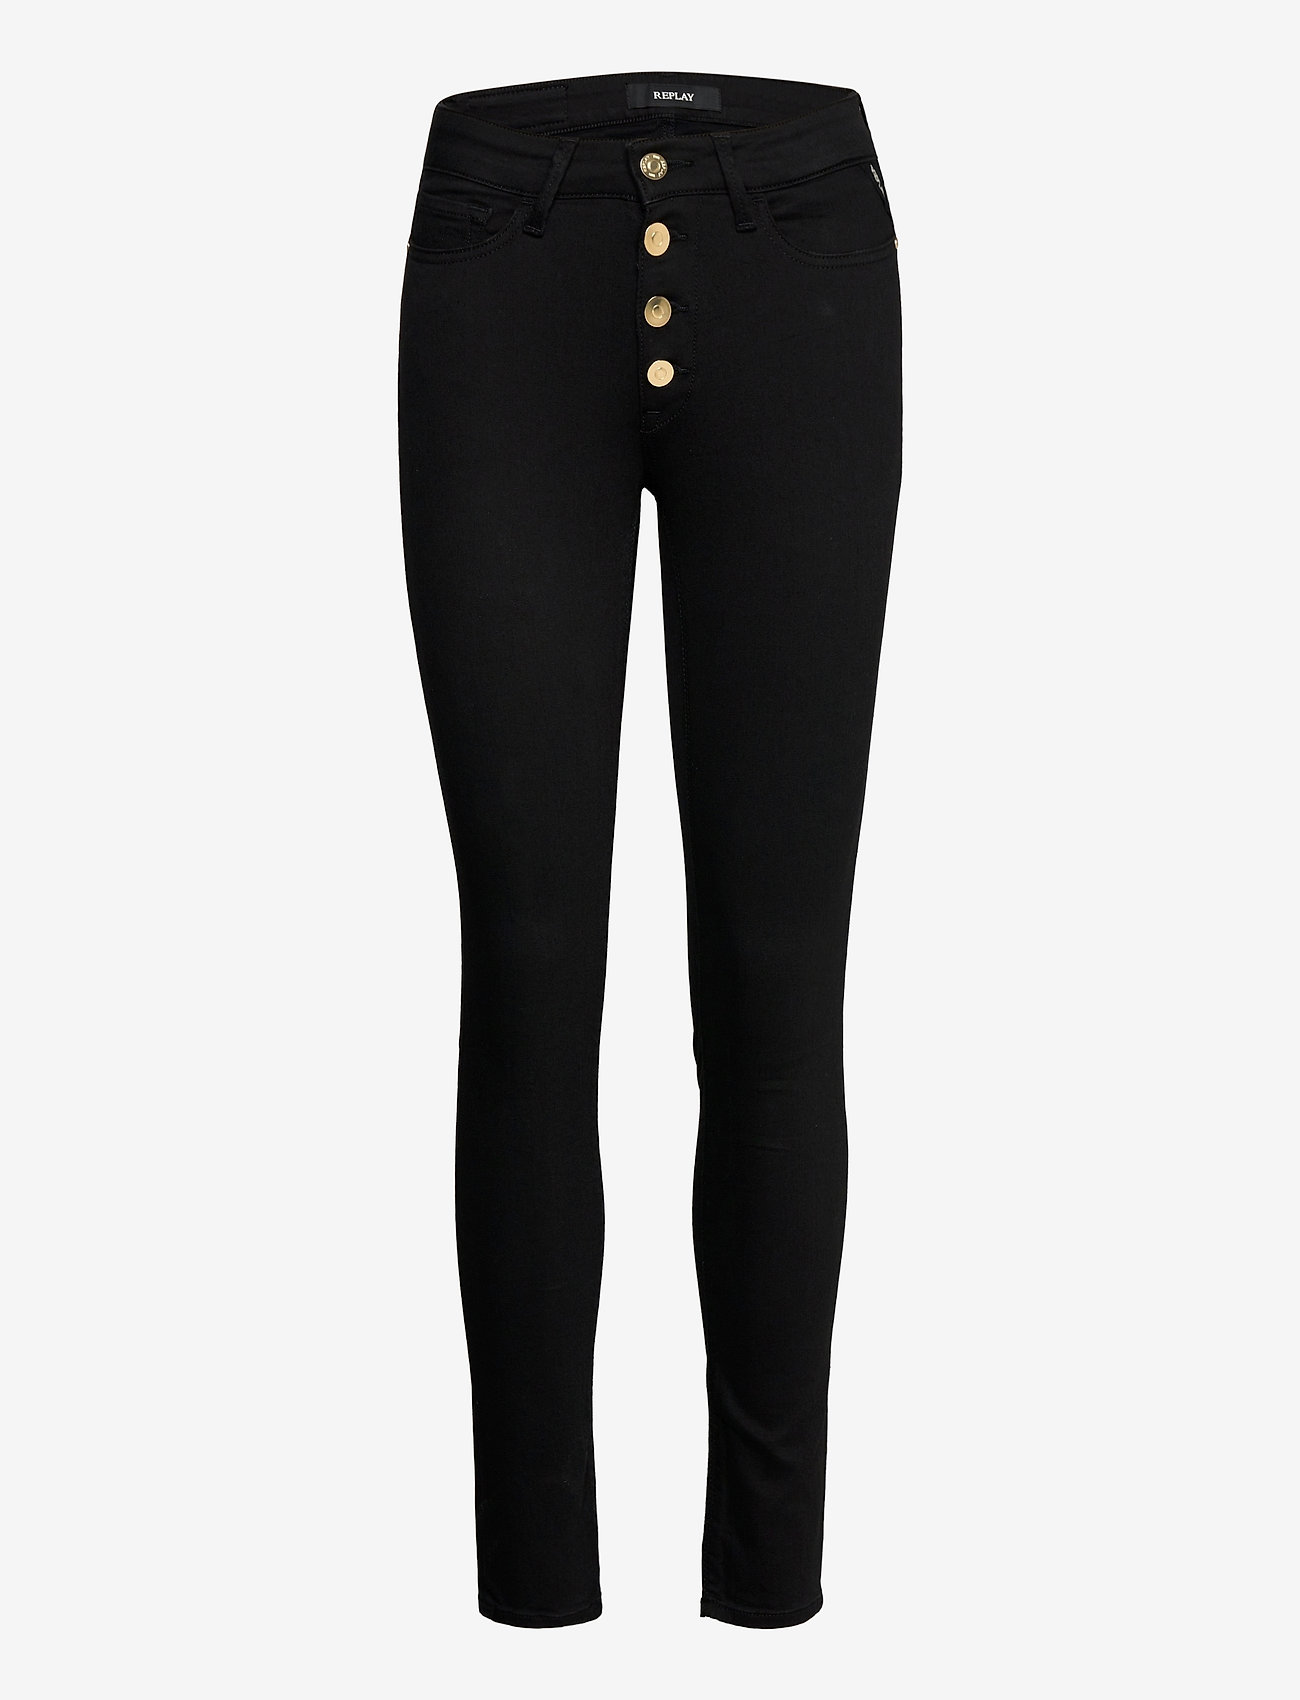 Replay - LUZIEN - slim jeans - black - 0